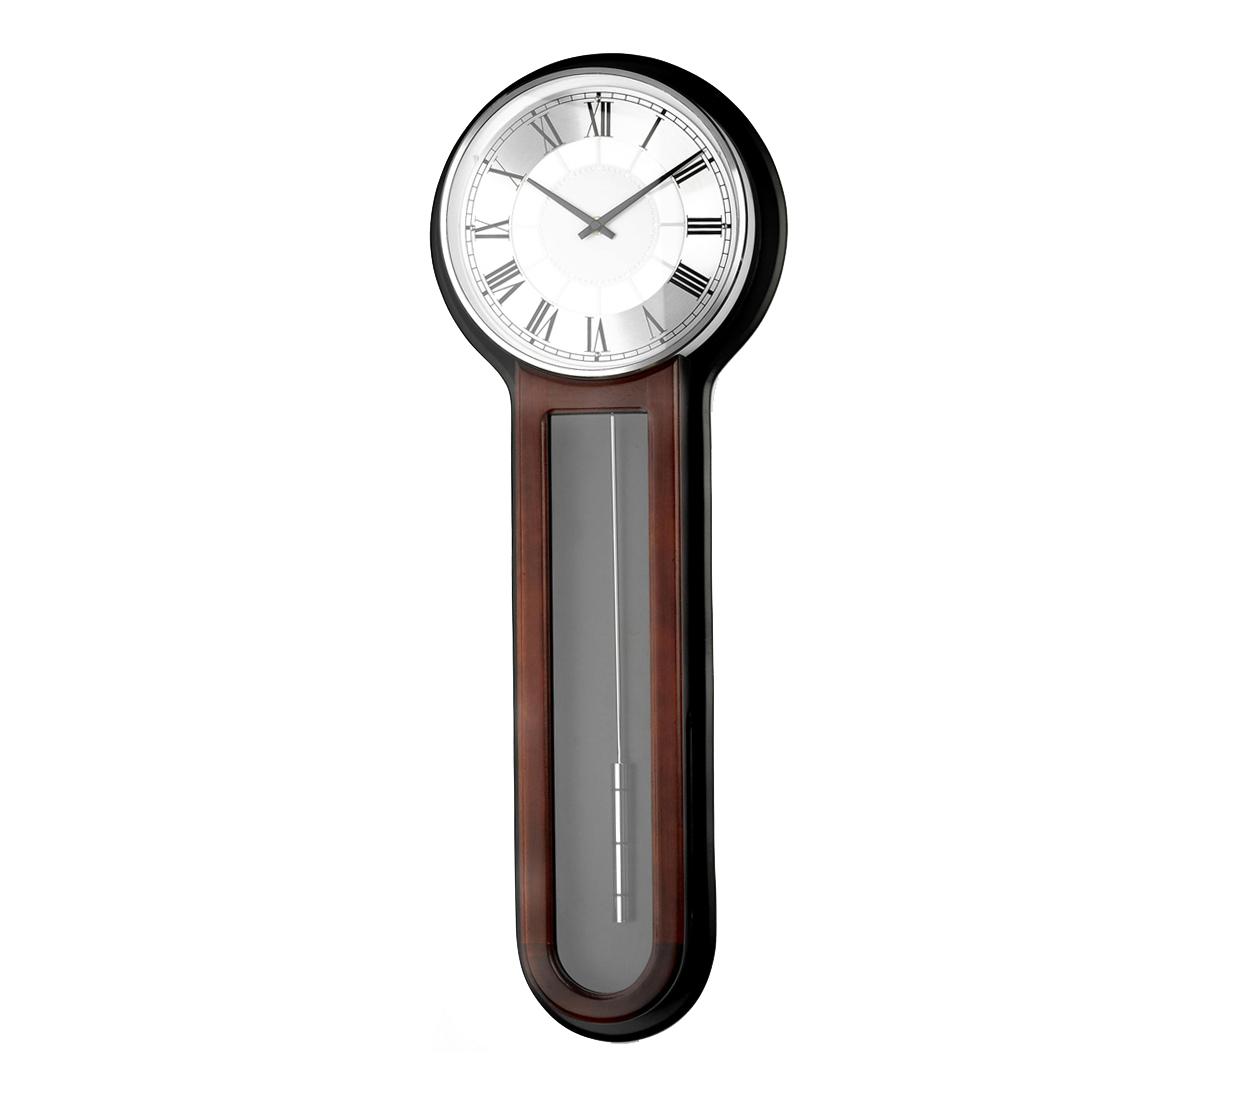 Reloj de pared con p ndulo seiko 70cm envio gratis - Relojes de pared diseno ...